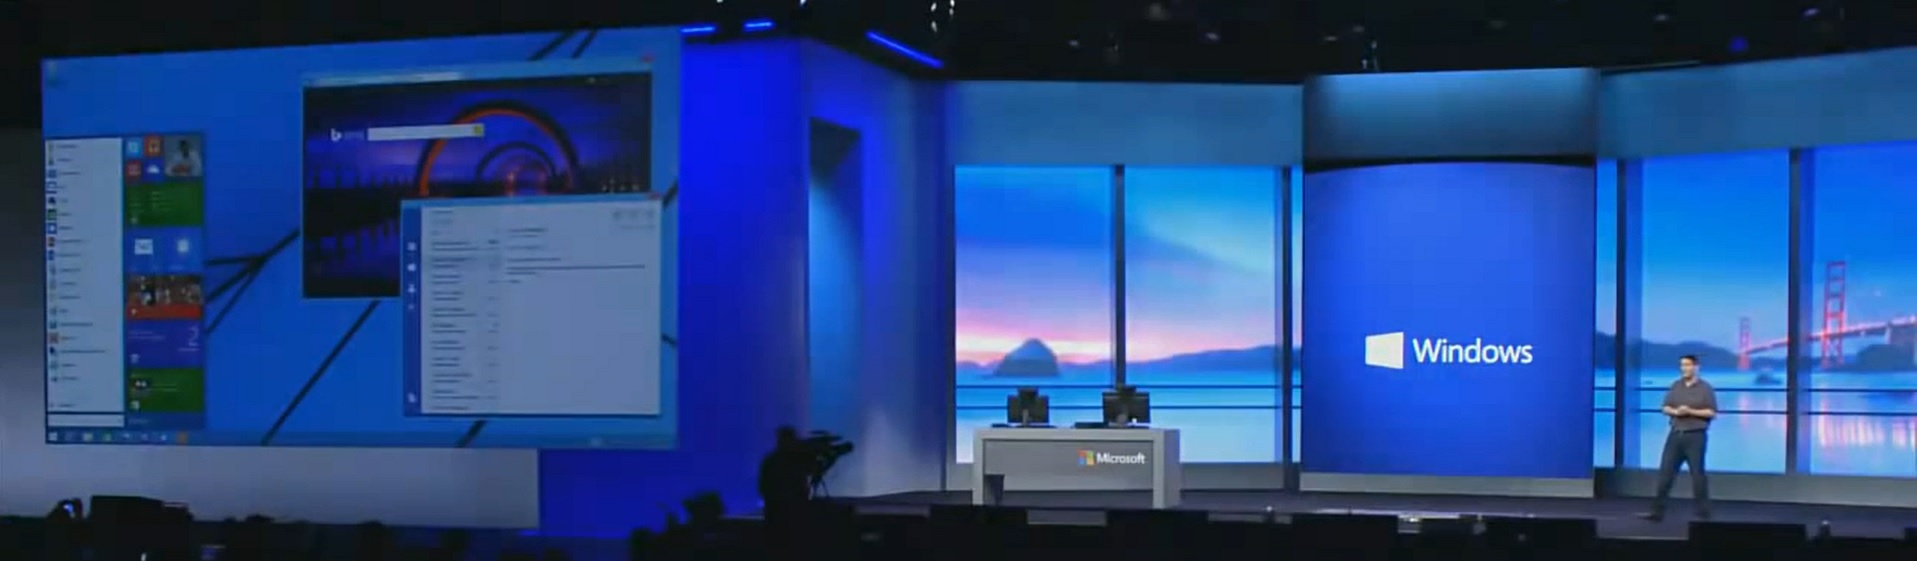 windows9_desktop